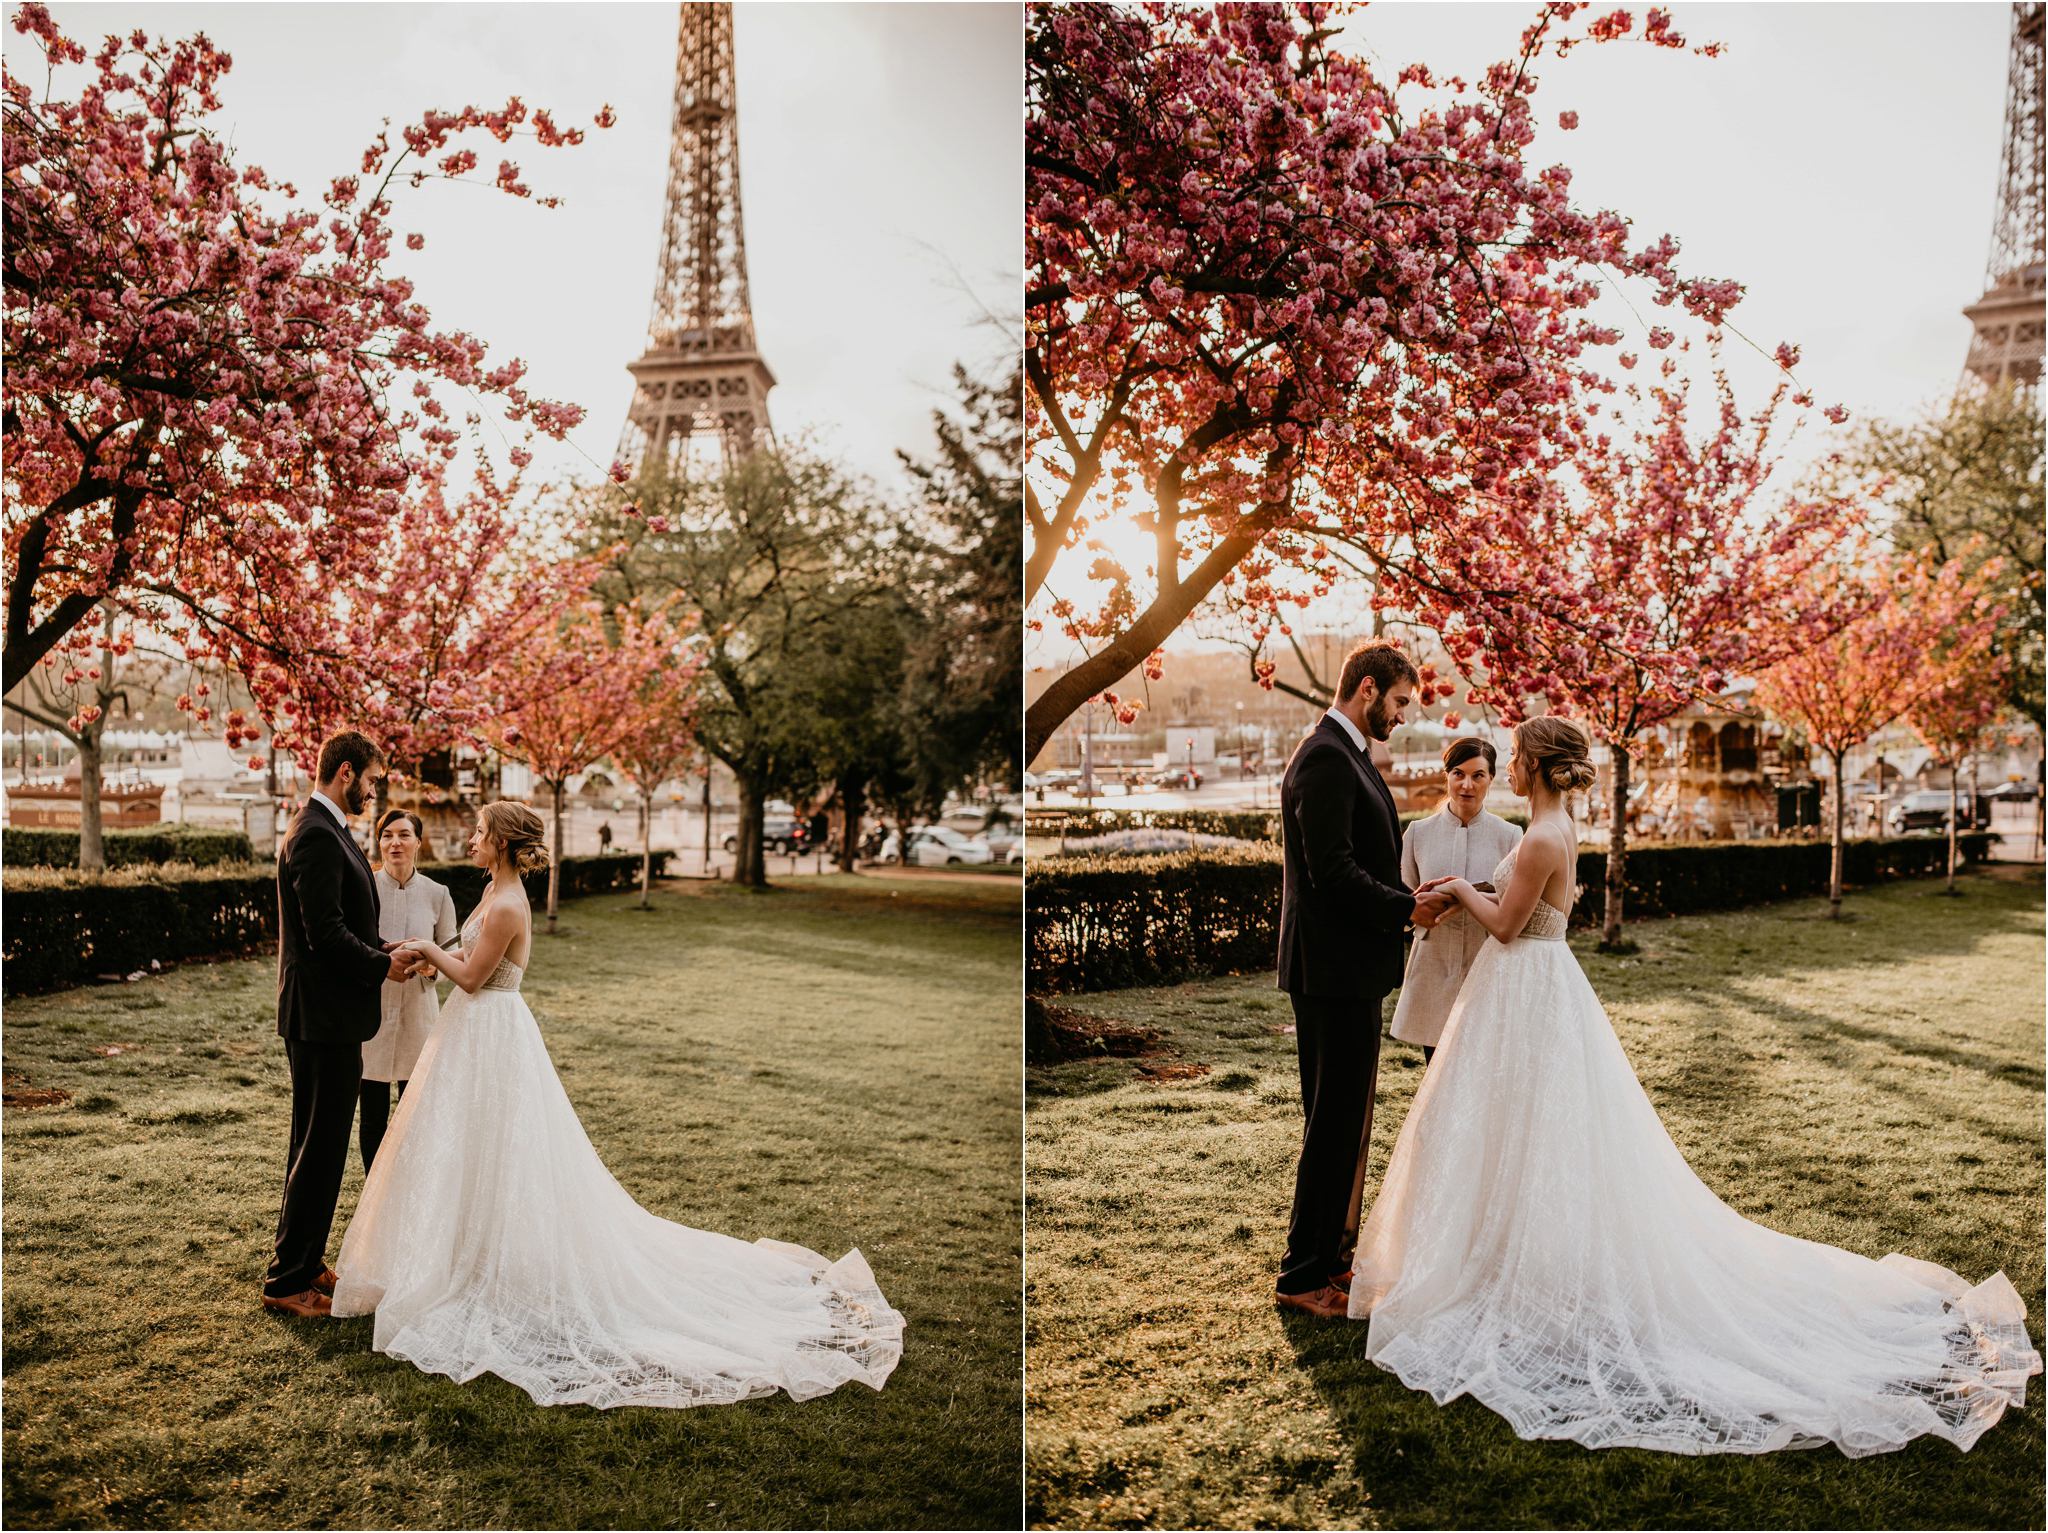 miranda-and-jared-paris-elopement-destination-wedding-photographer-031.jpg